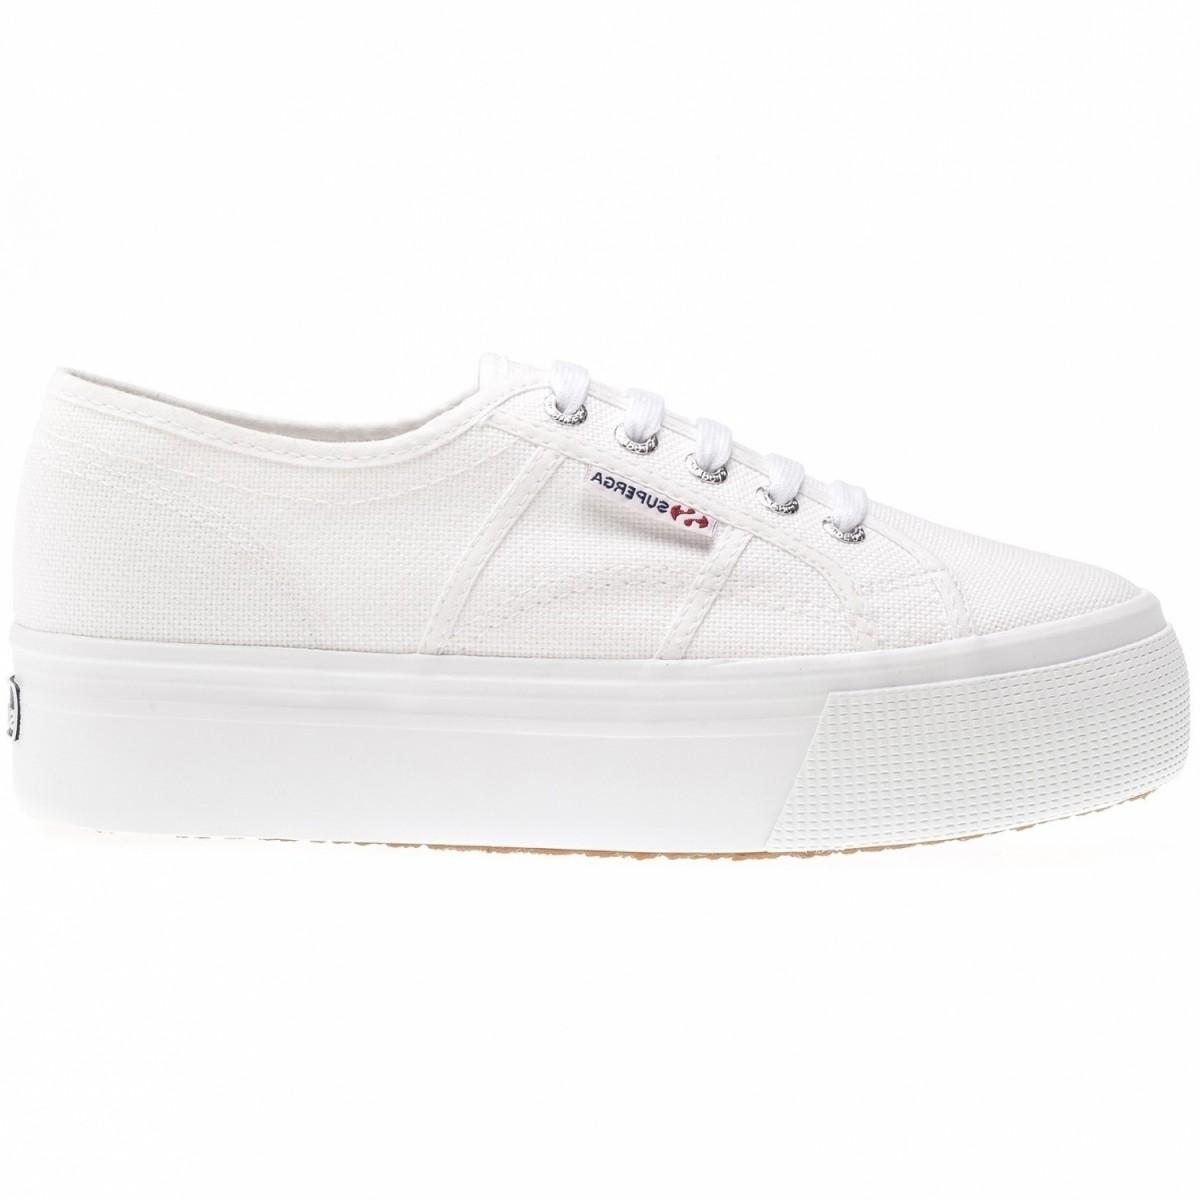 Superga 2790 Actow Linea Up & Down Sneaker